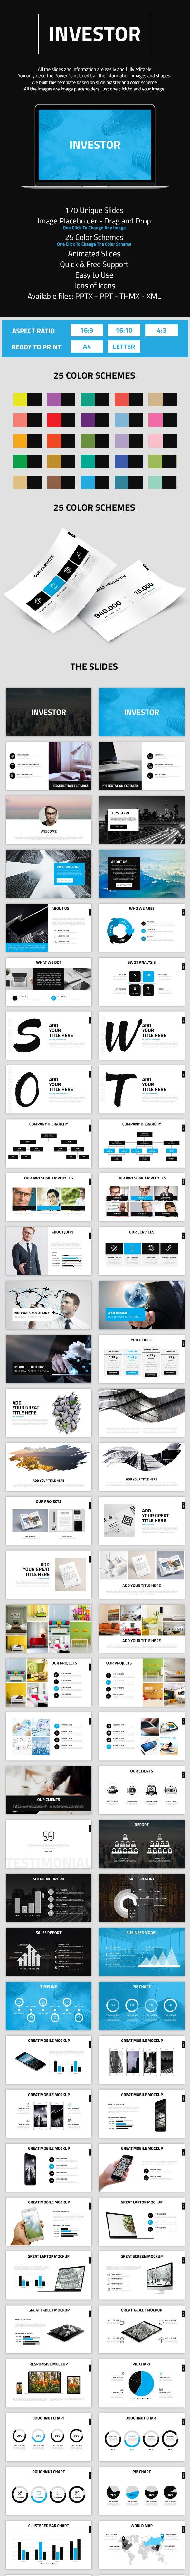 Investor - Business PowerPoint Presentation Template - Business PowerPoint Templates